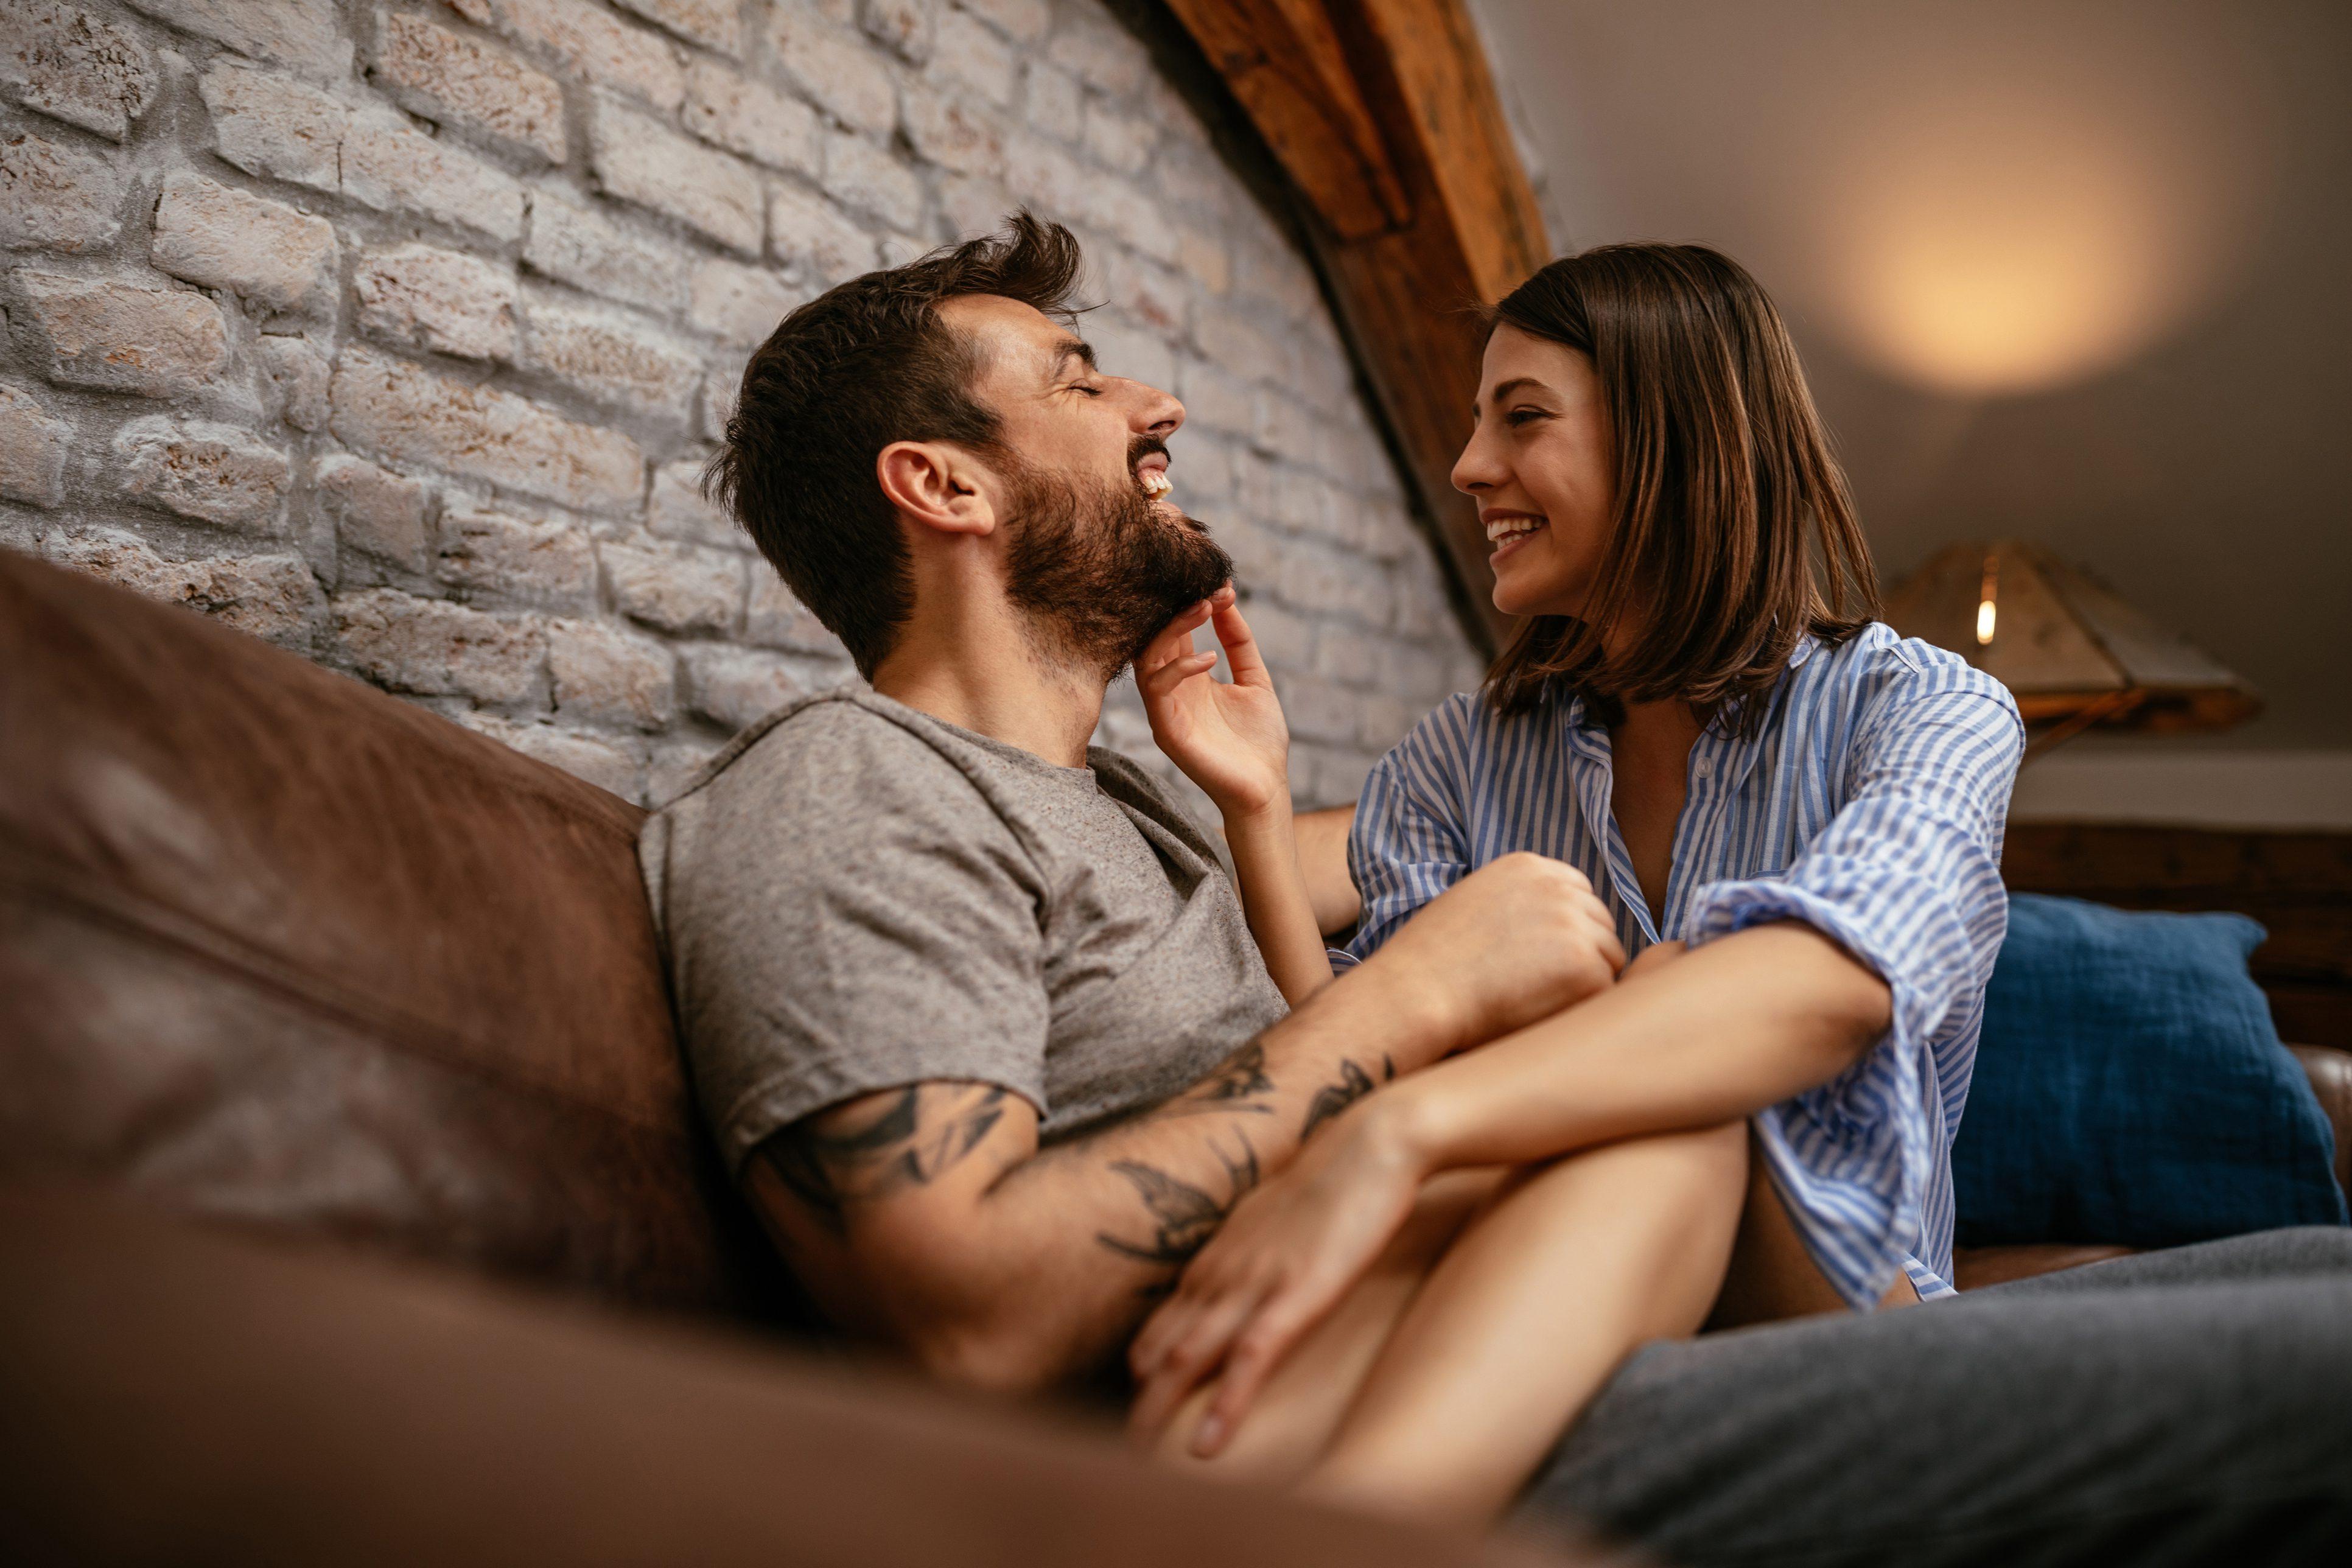 Online Dating: Do Women Find Men With Beards Attractive?